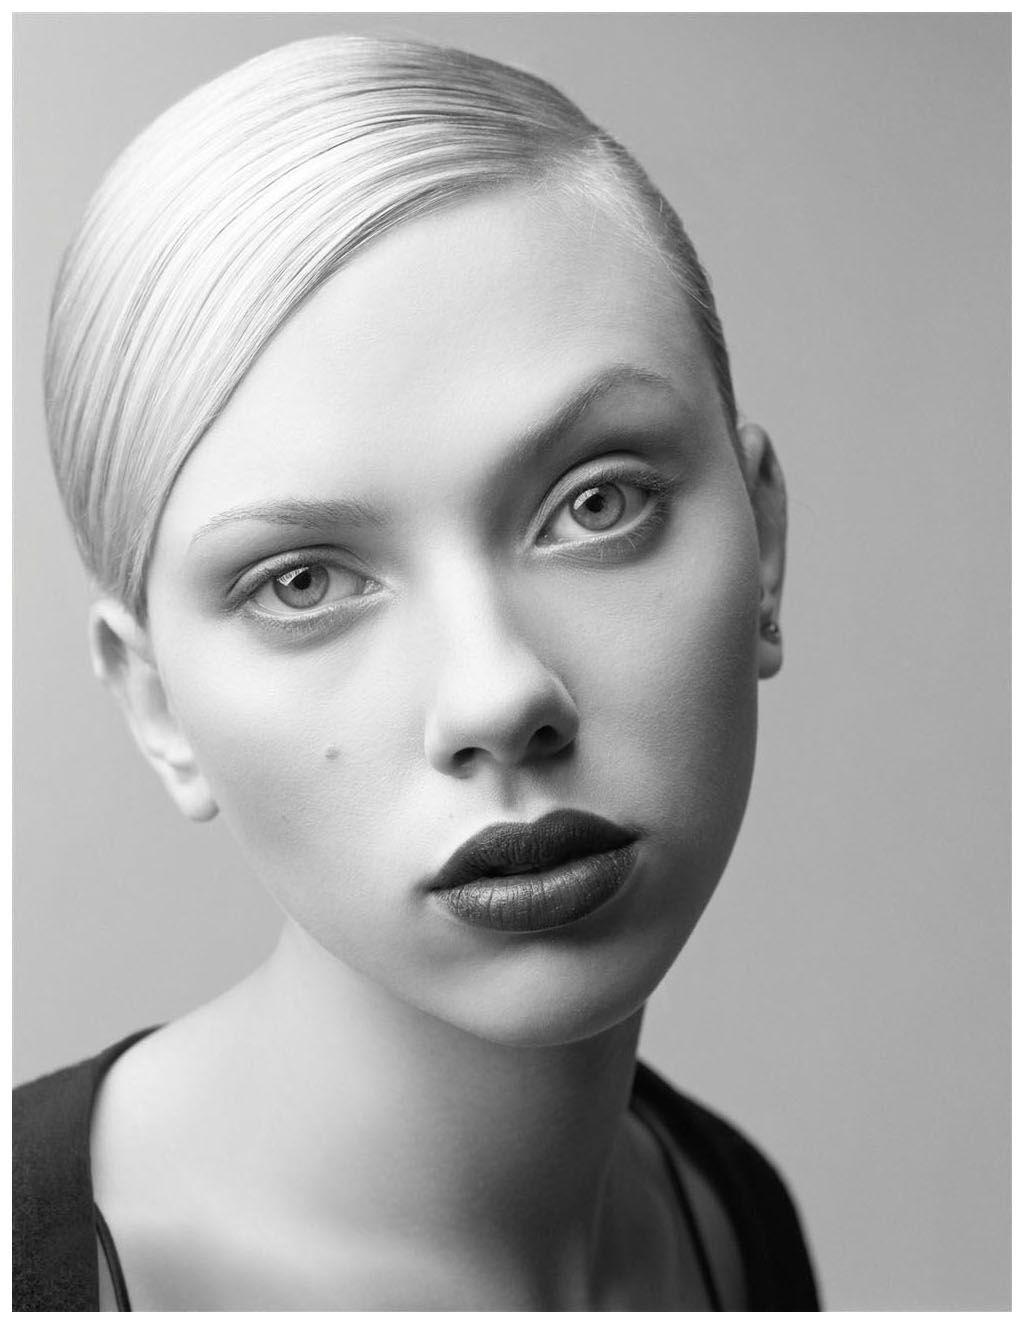 Scarlett Johansson Photo Craig Mcdean Scarlett Johansson Portrait Craig Mcdean